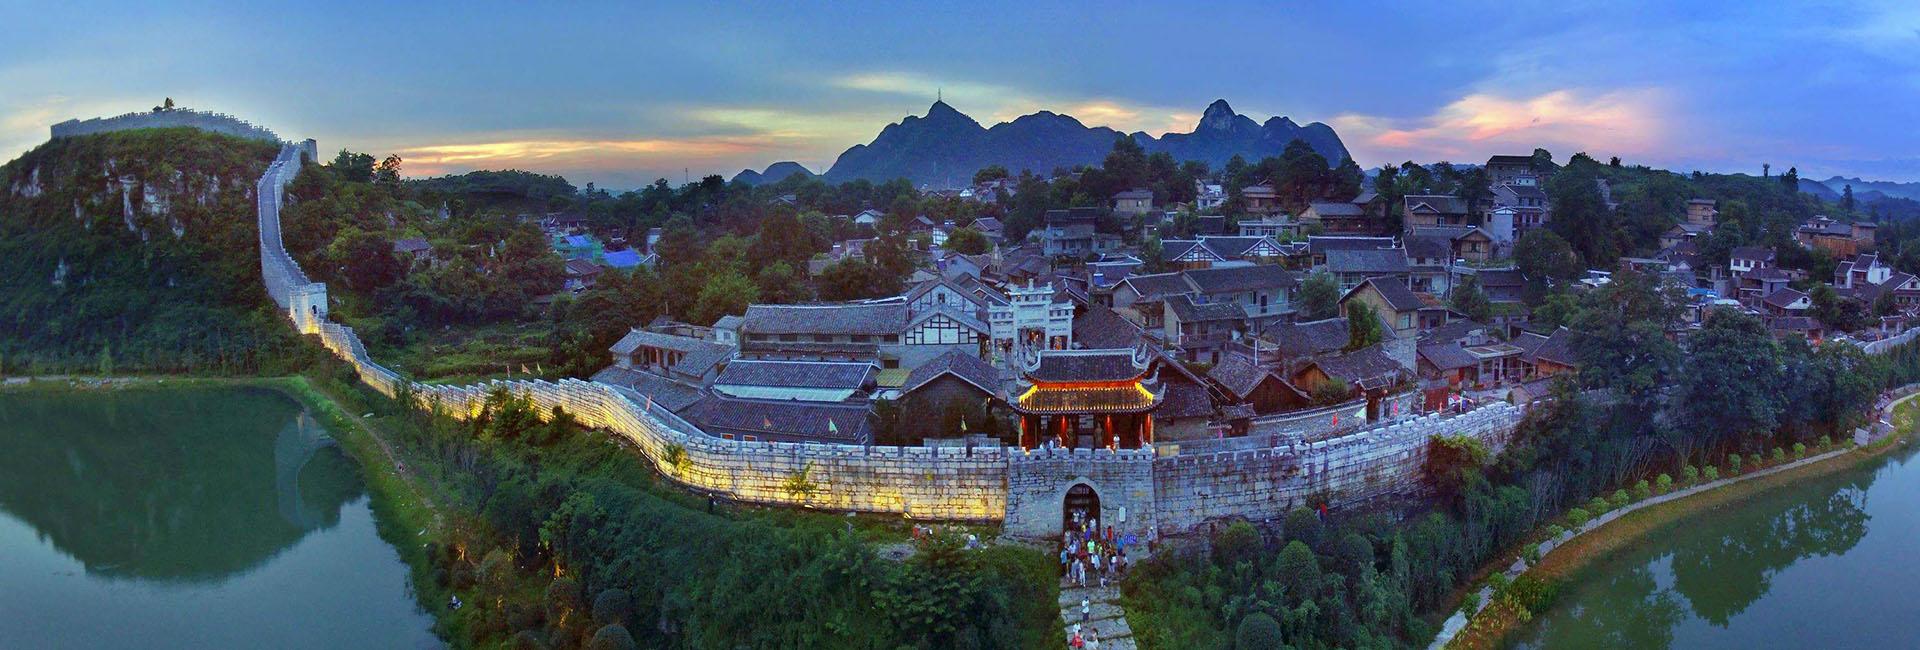 Qingyan.jpg